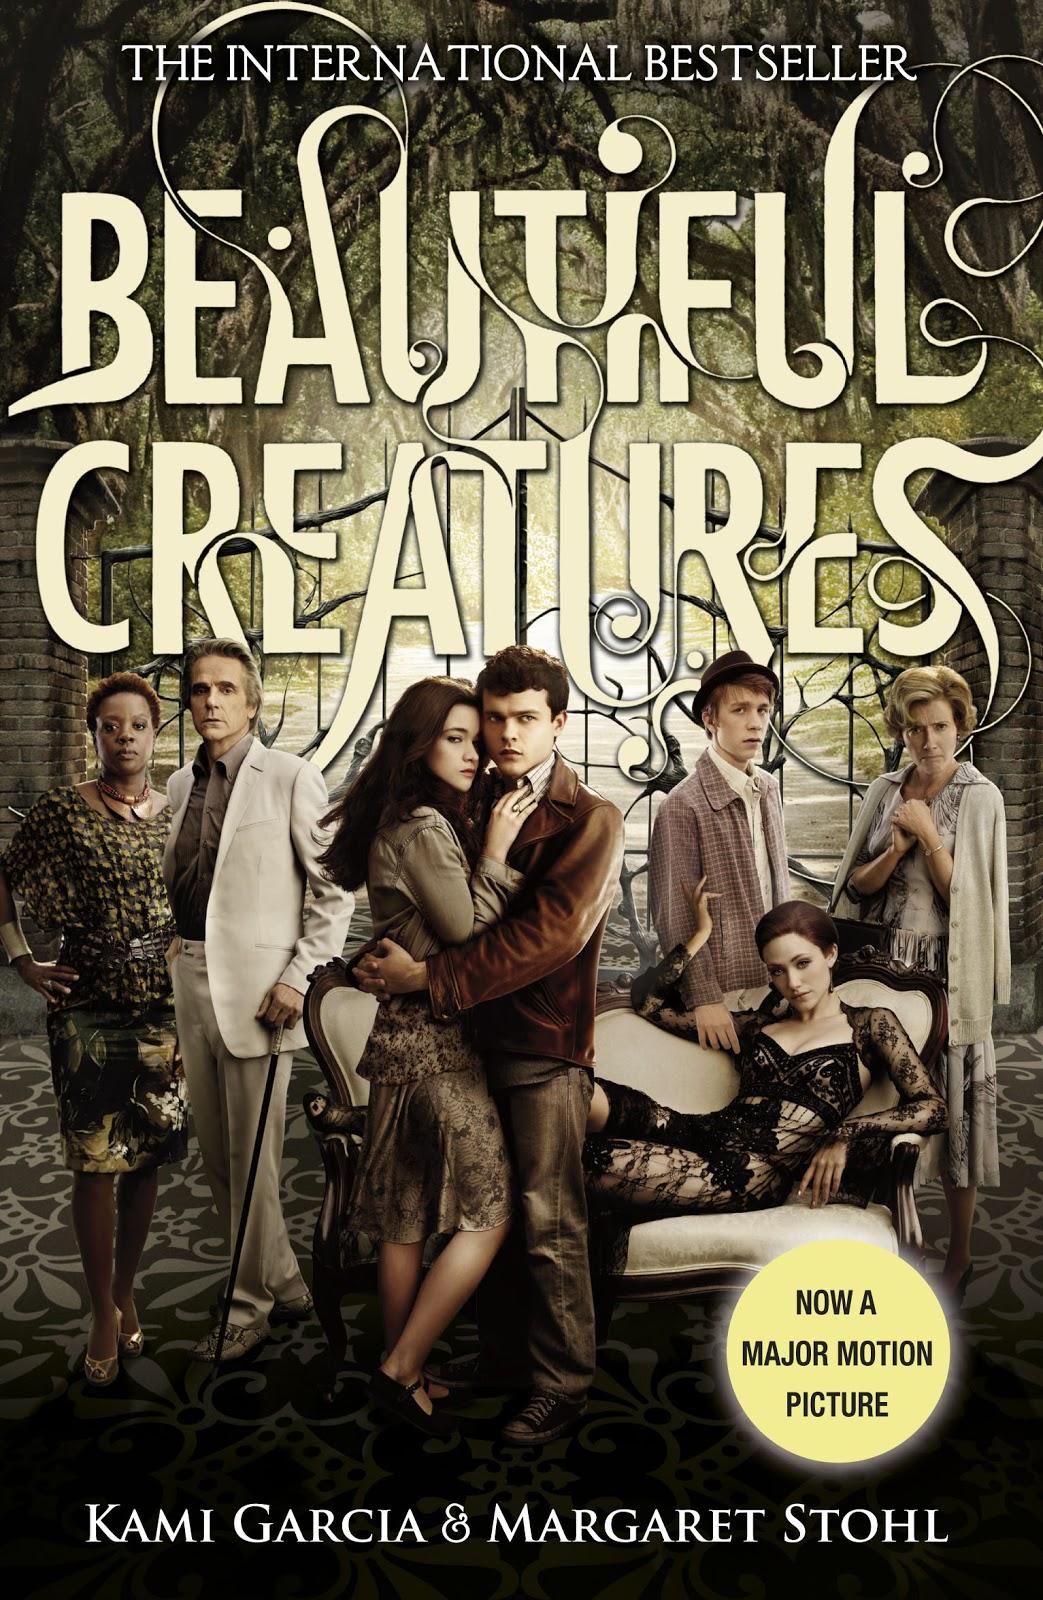 Phim Gia Tộc Huyền Bí - Beautiful Creatures 2013